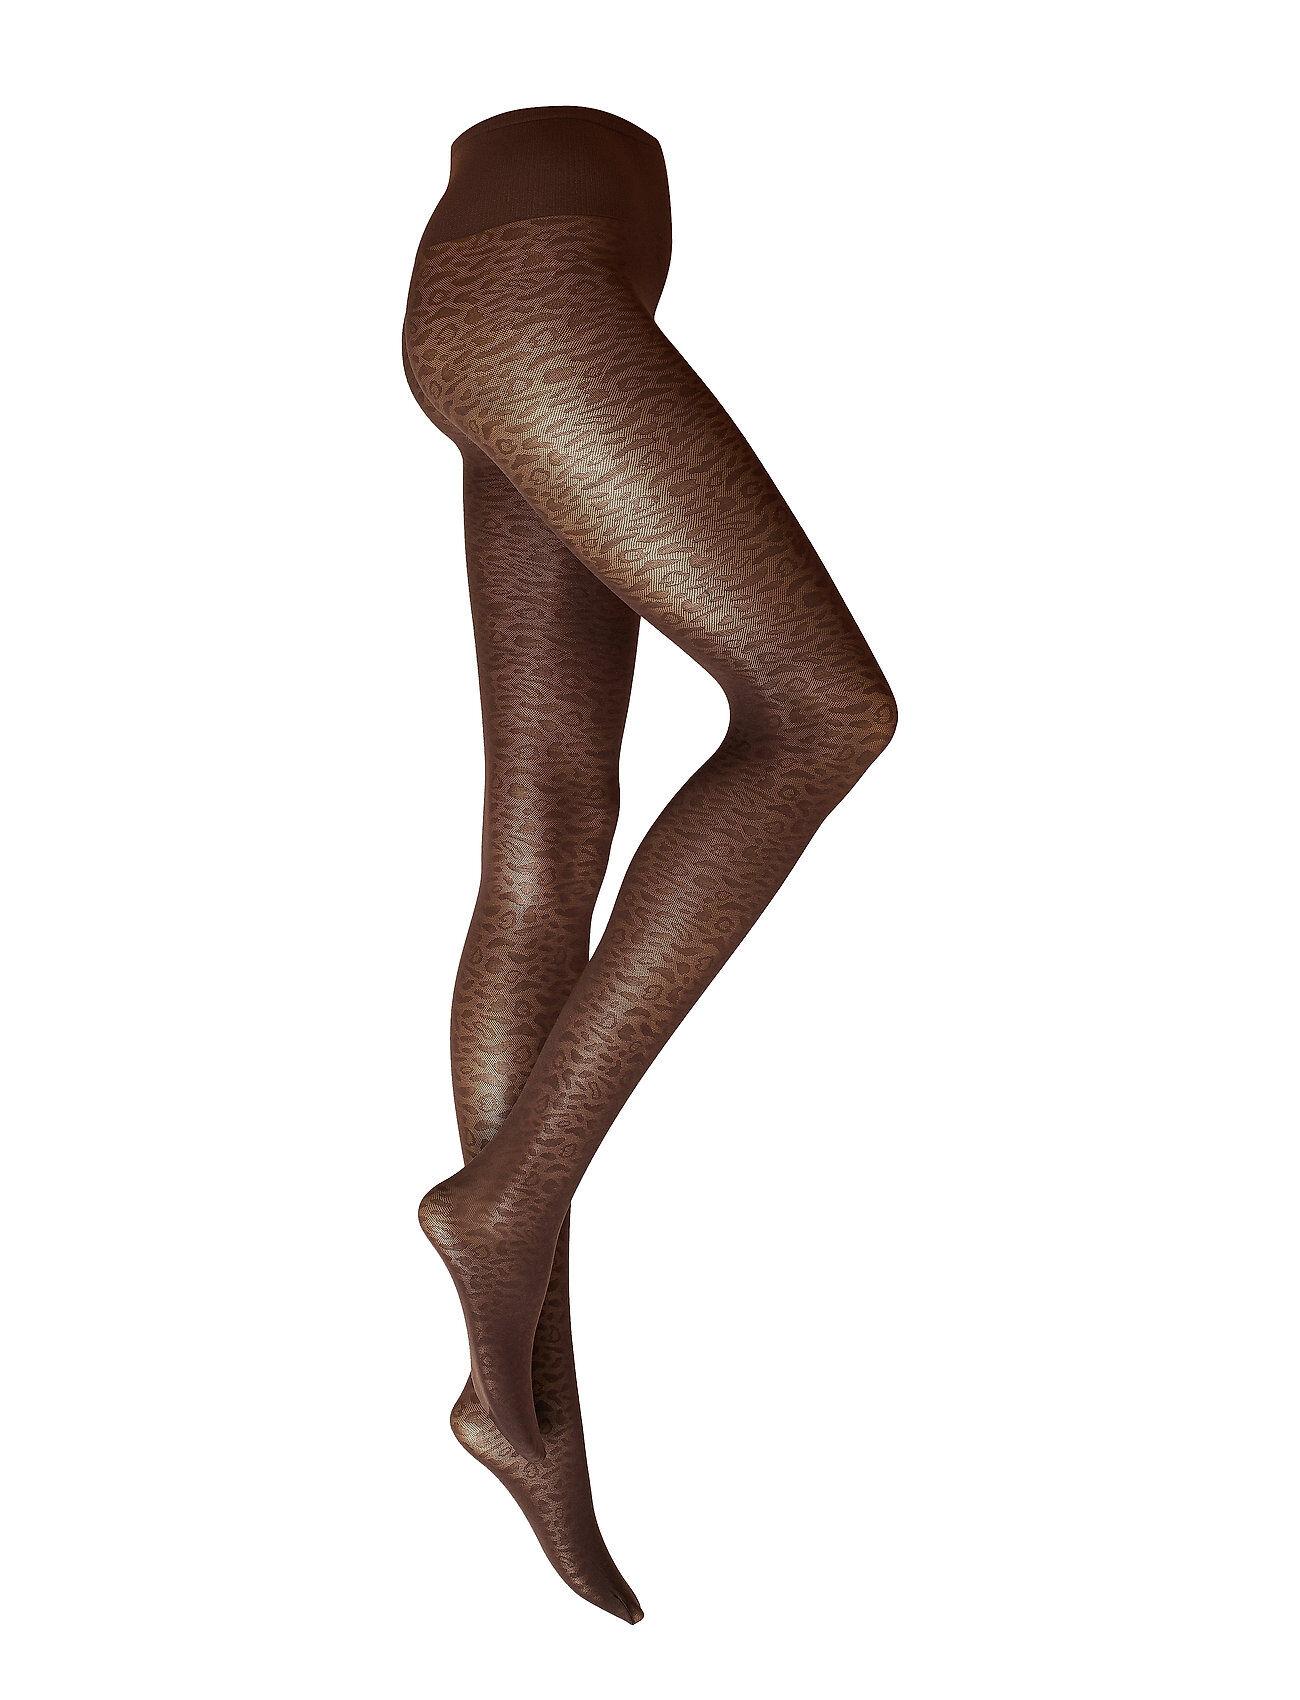 Swedish Stockings Emma Leopard Tights Sukkahousut Ruskea Swedish Stockings